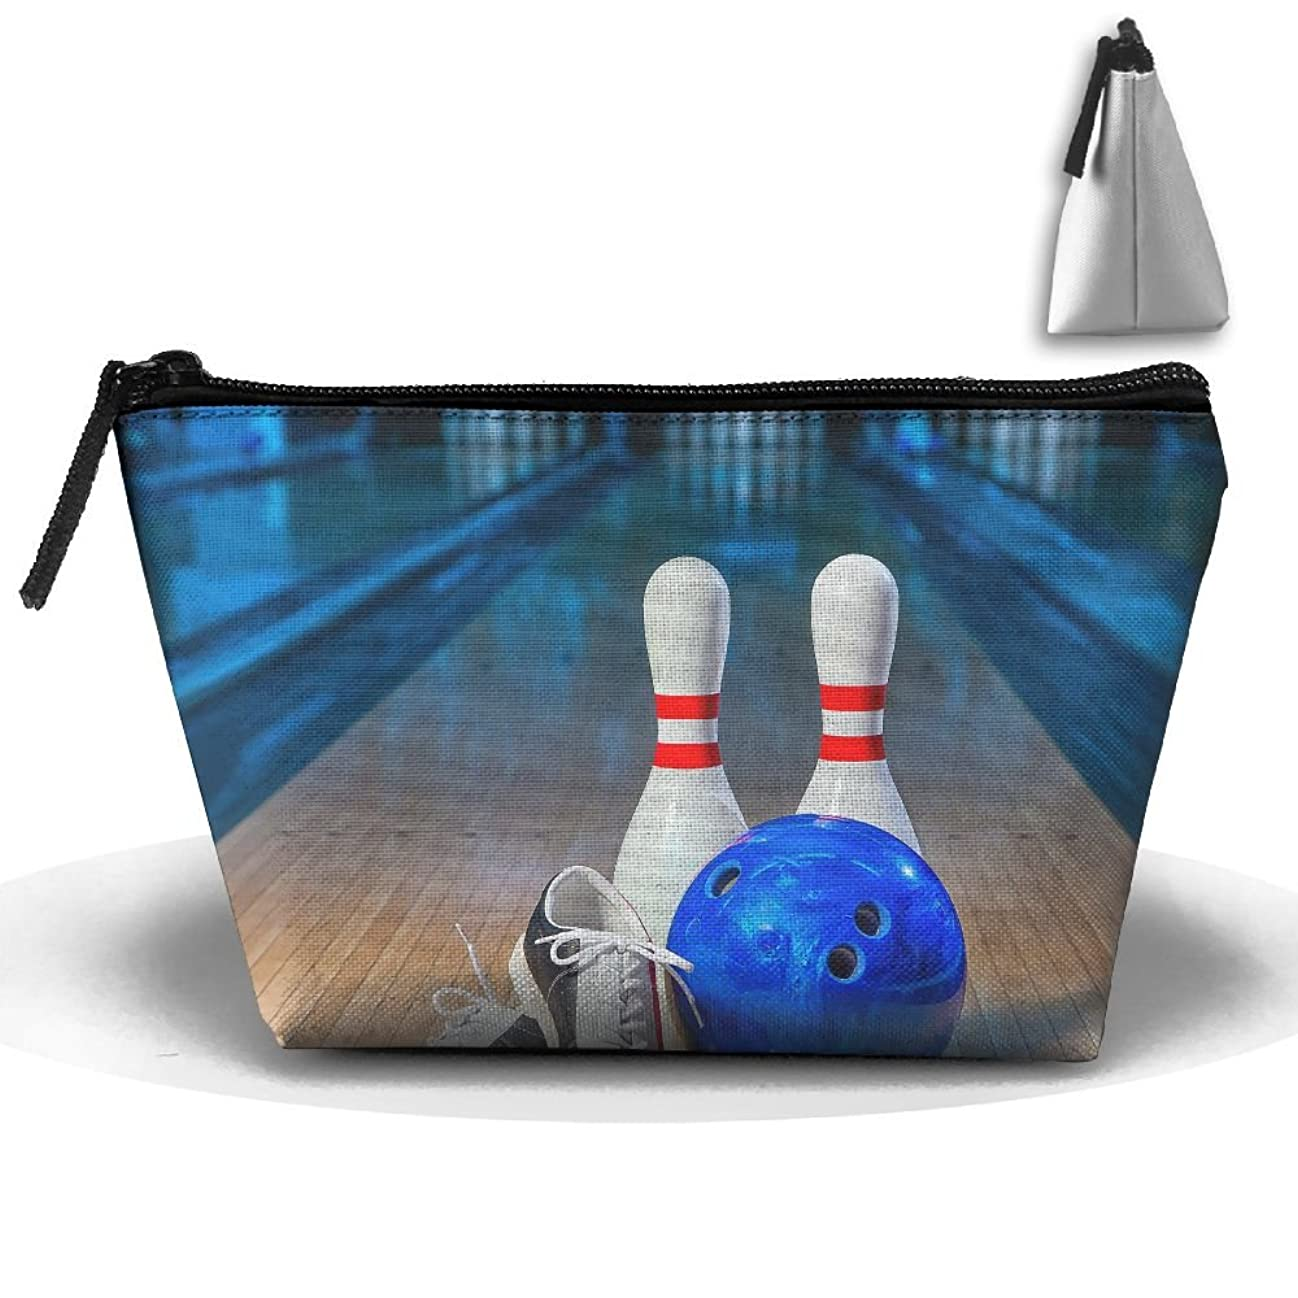 Travel Cosmetic Bags Bowling Shoes Small Makeup Bag Multifunction Pouch Cosmetic Handbag Toiletries Organizer Bag for Women Girl